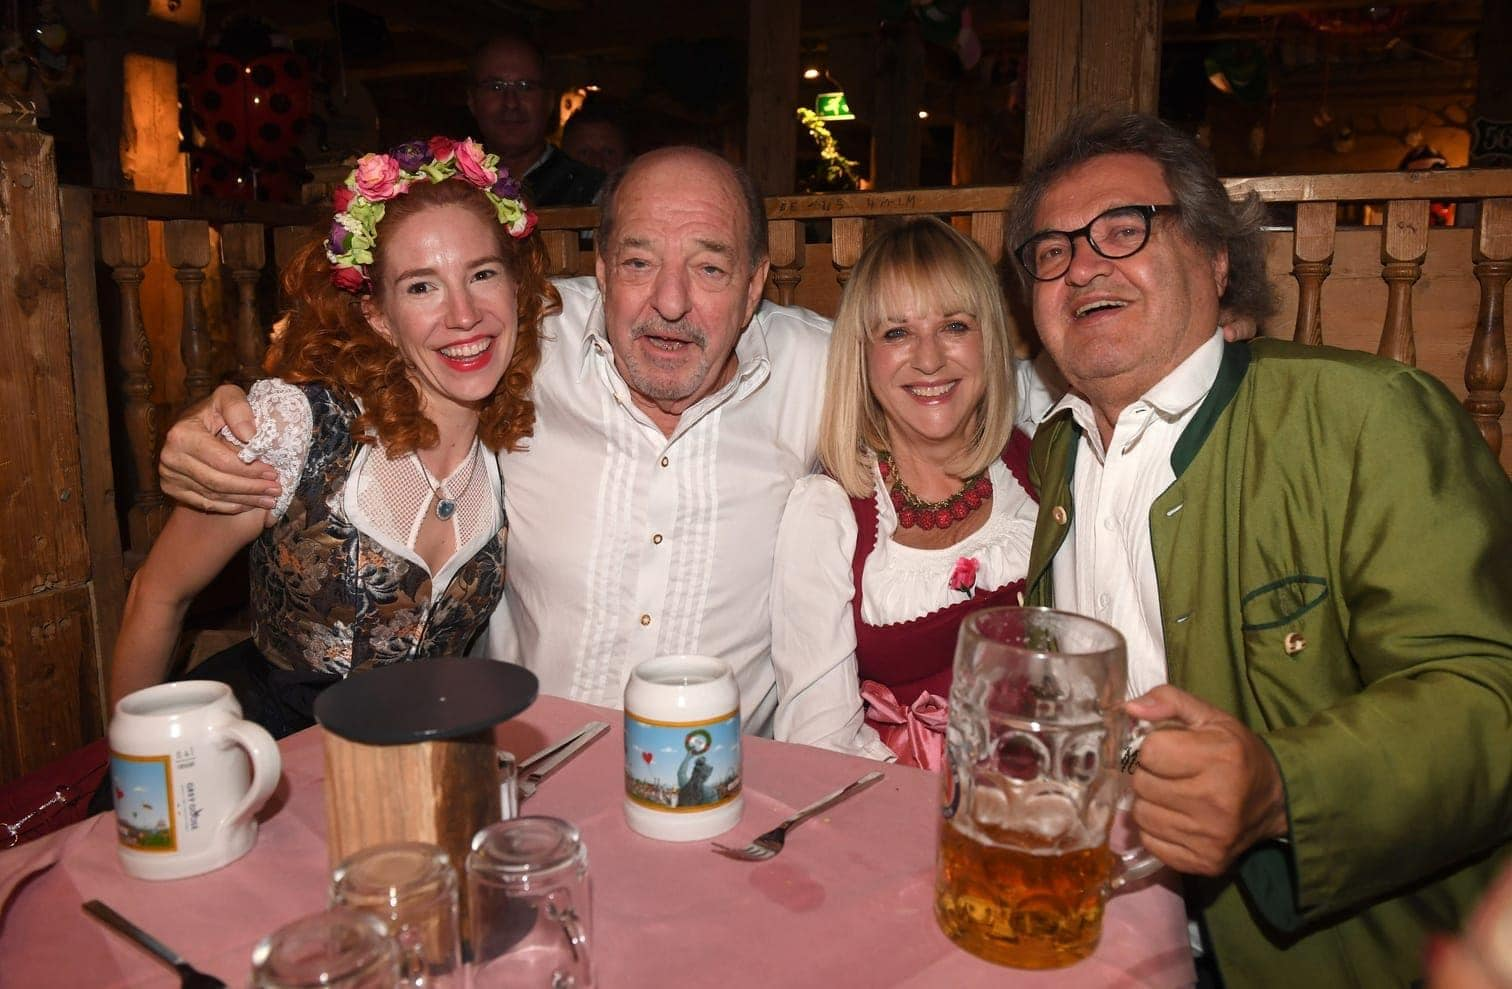 <p>Sportfunktionär Wolfgang Niersbach kam mit seiner Freundin Marion Popp.</p> Foto: dpa